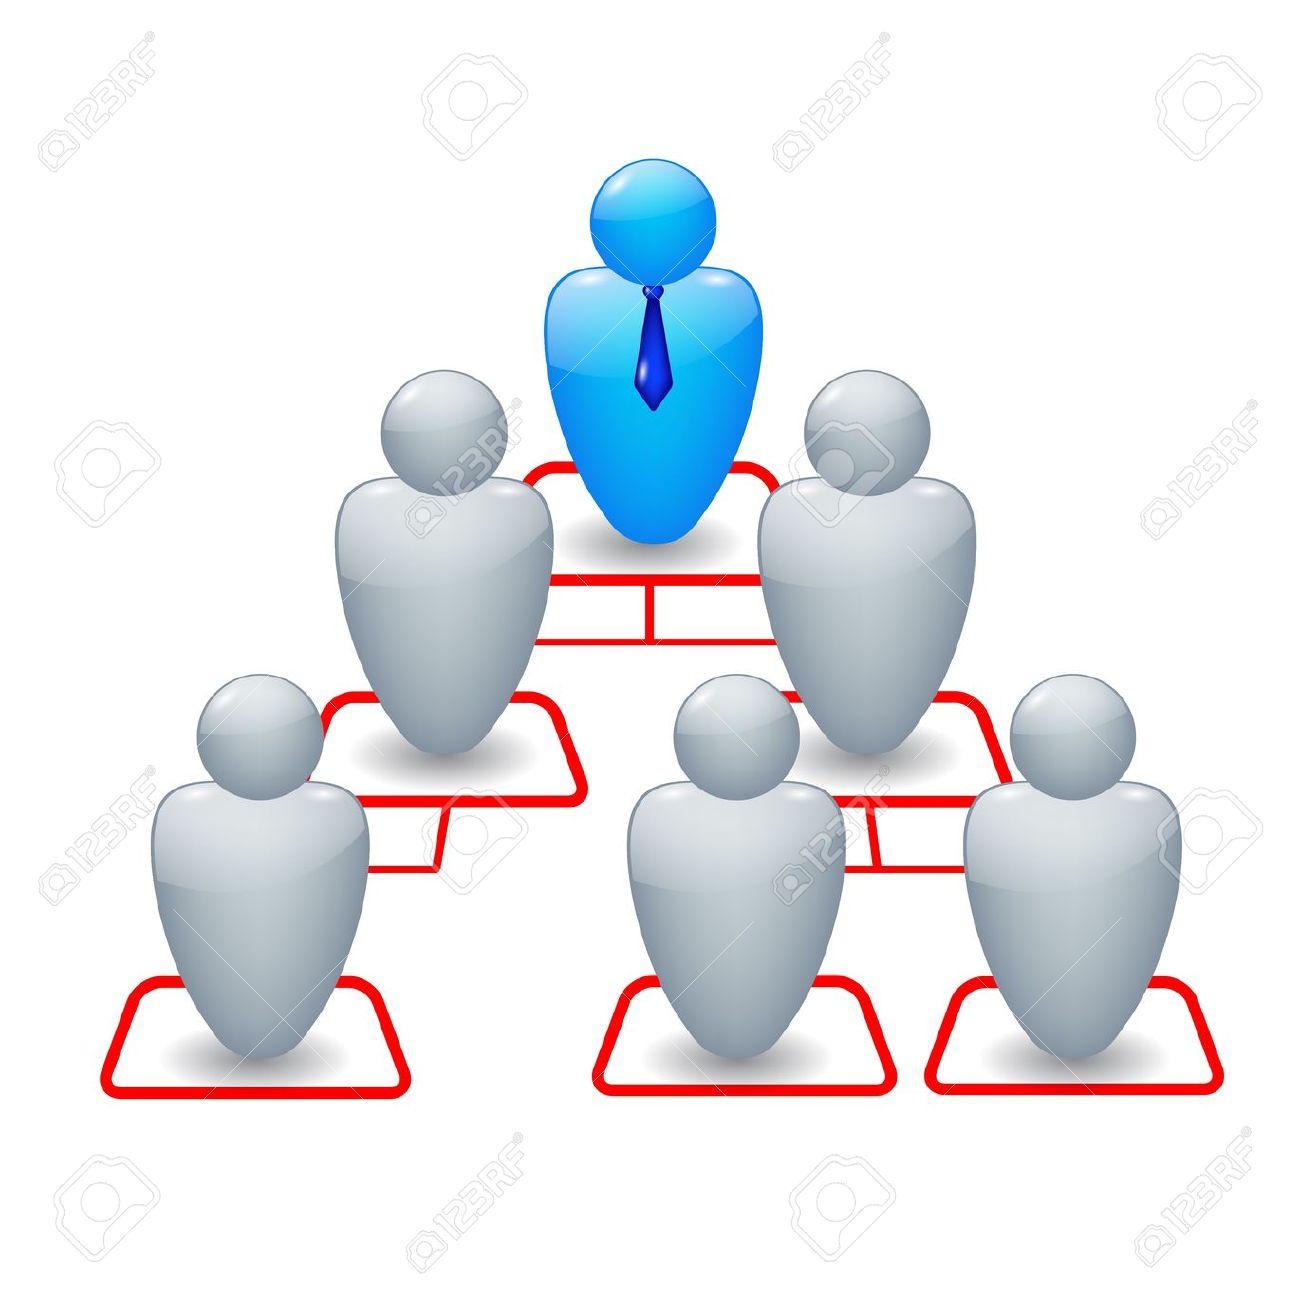 Organisation structure clipart.